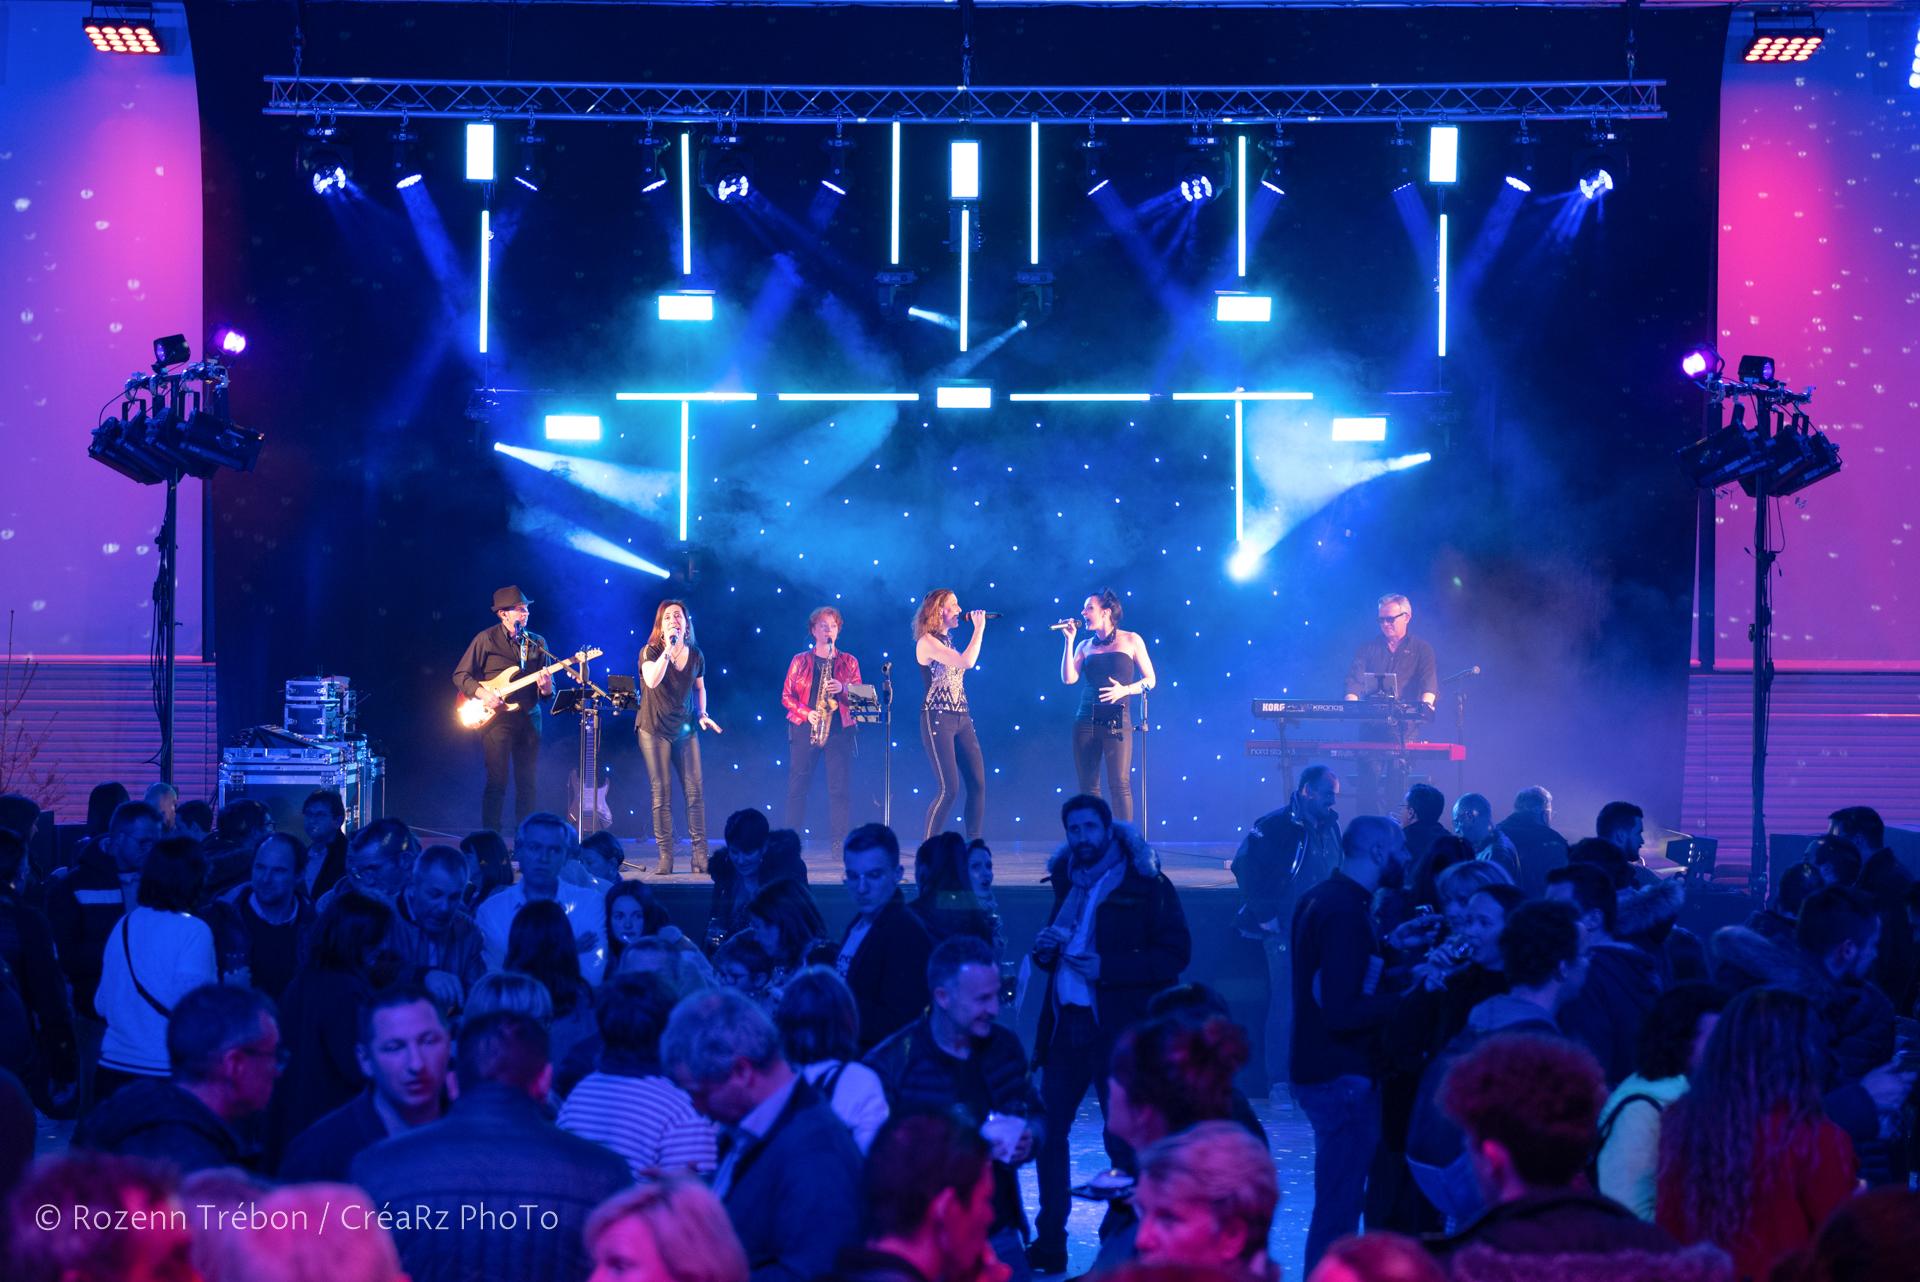 Six-All concert Arena Brest (15 sur 80)